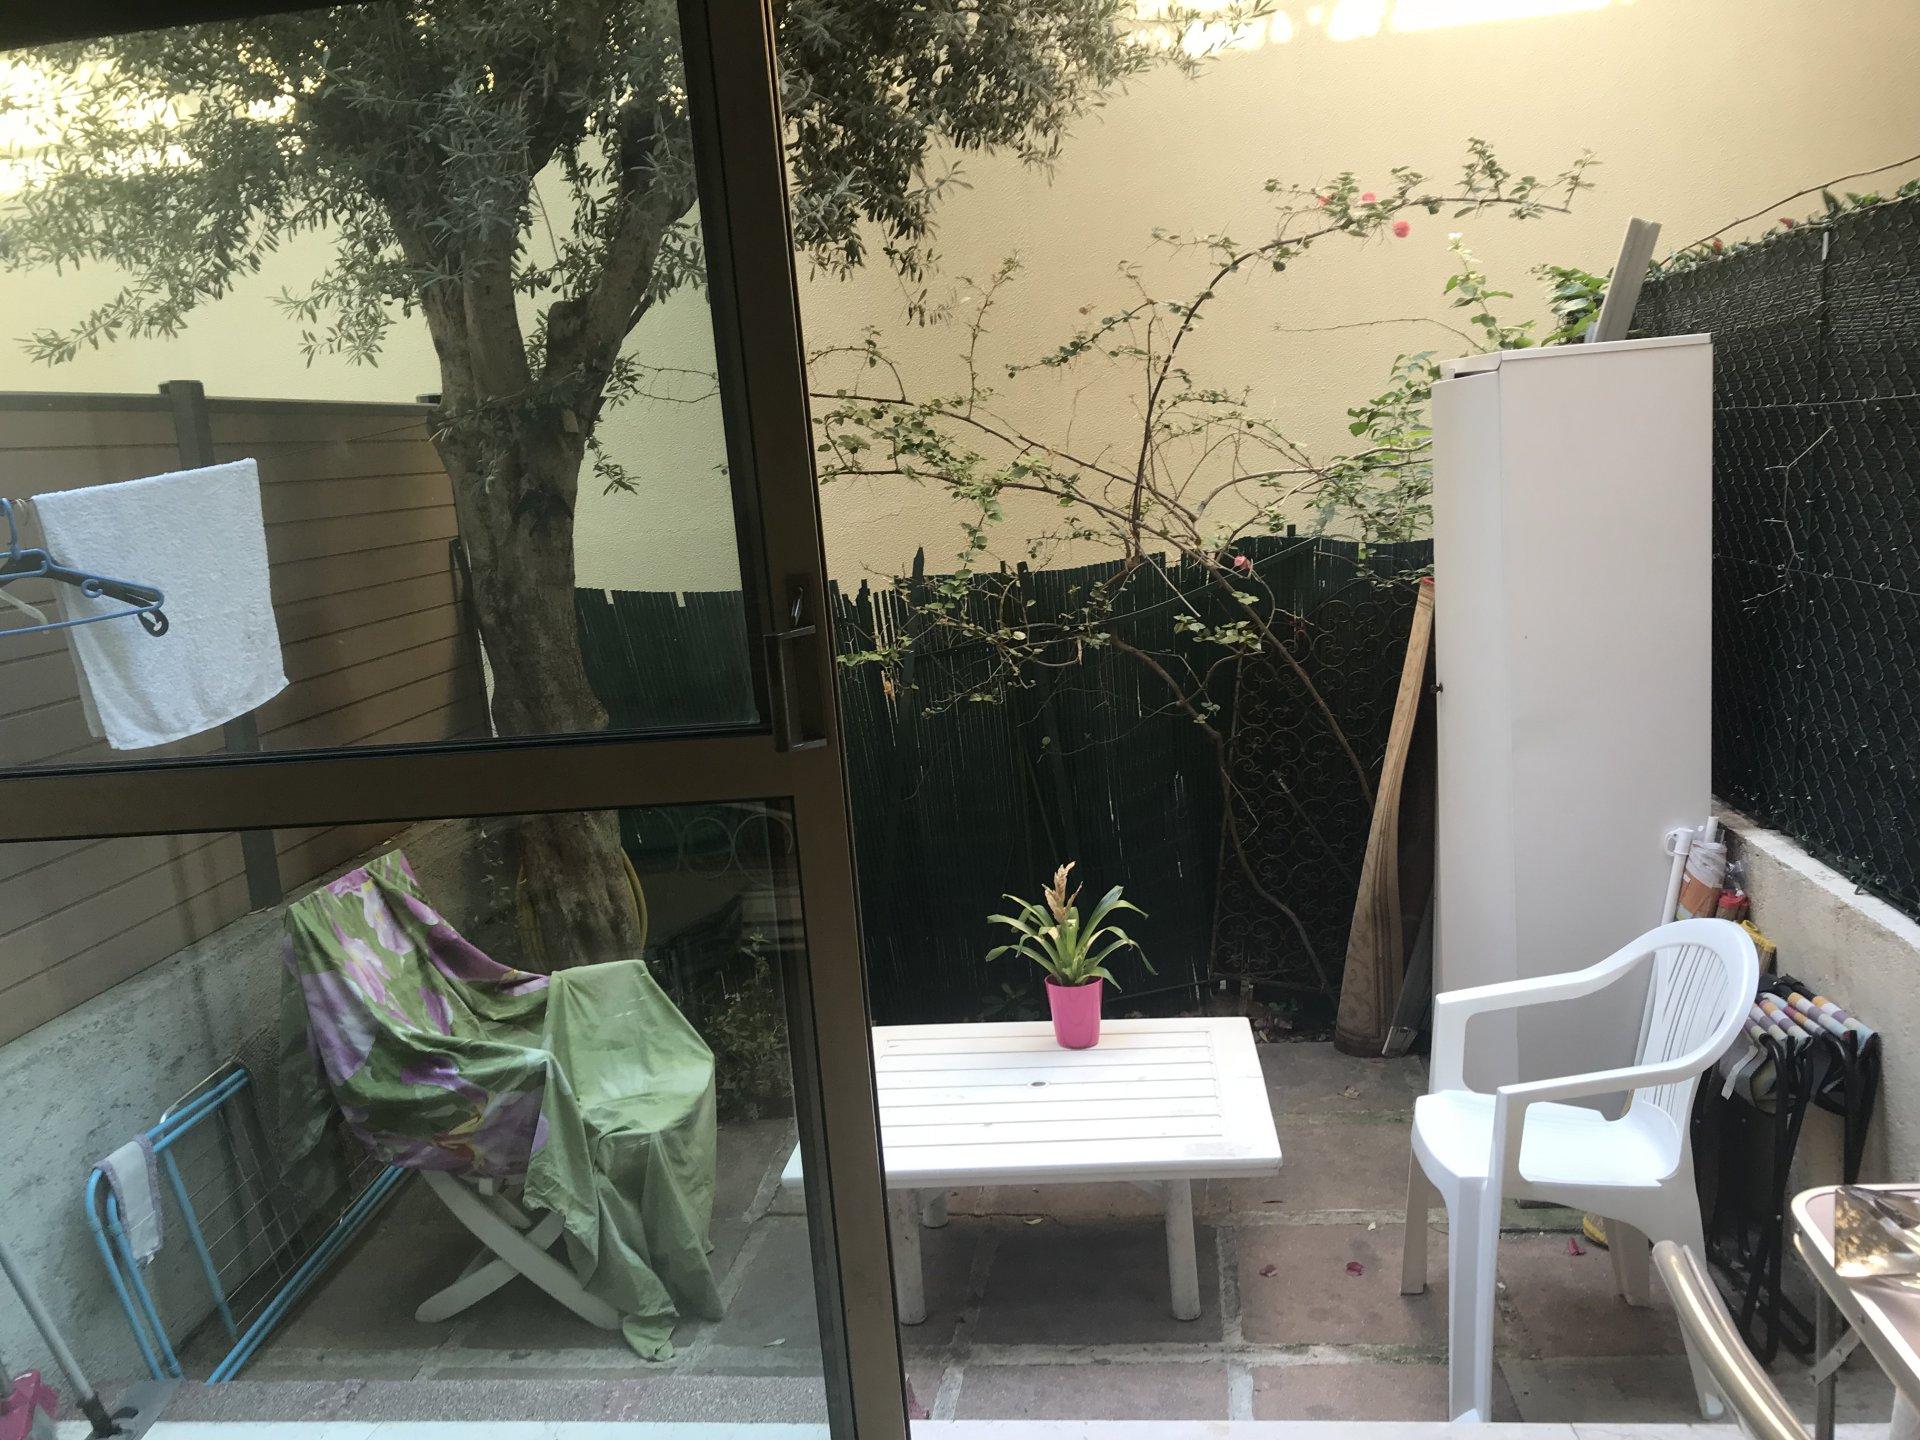 Studio, Nice Piétonne, terrasse